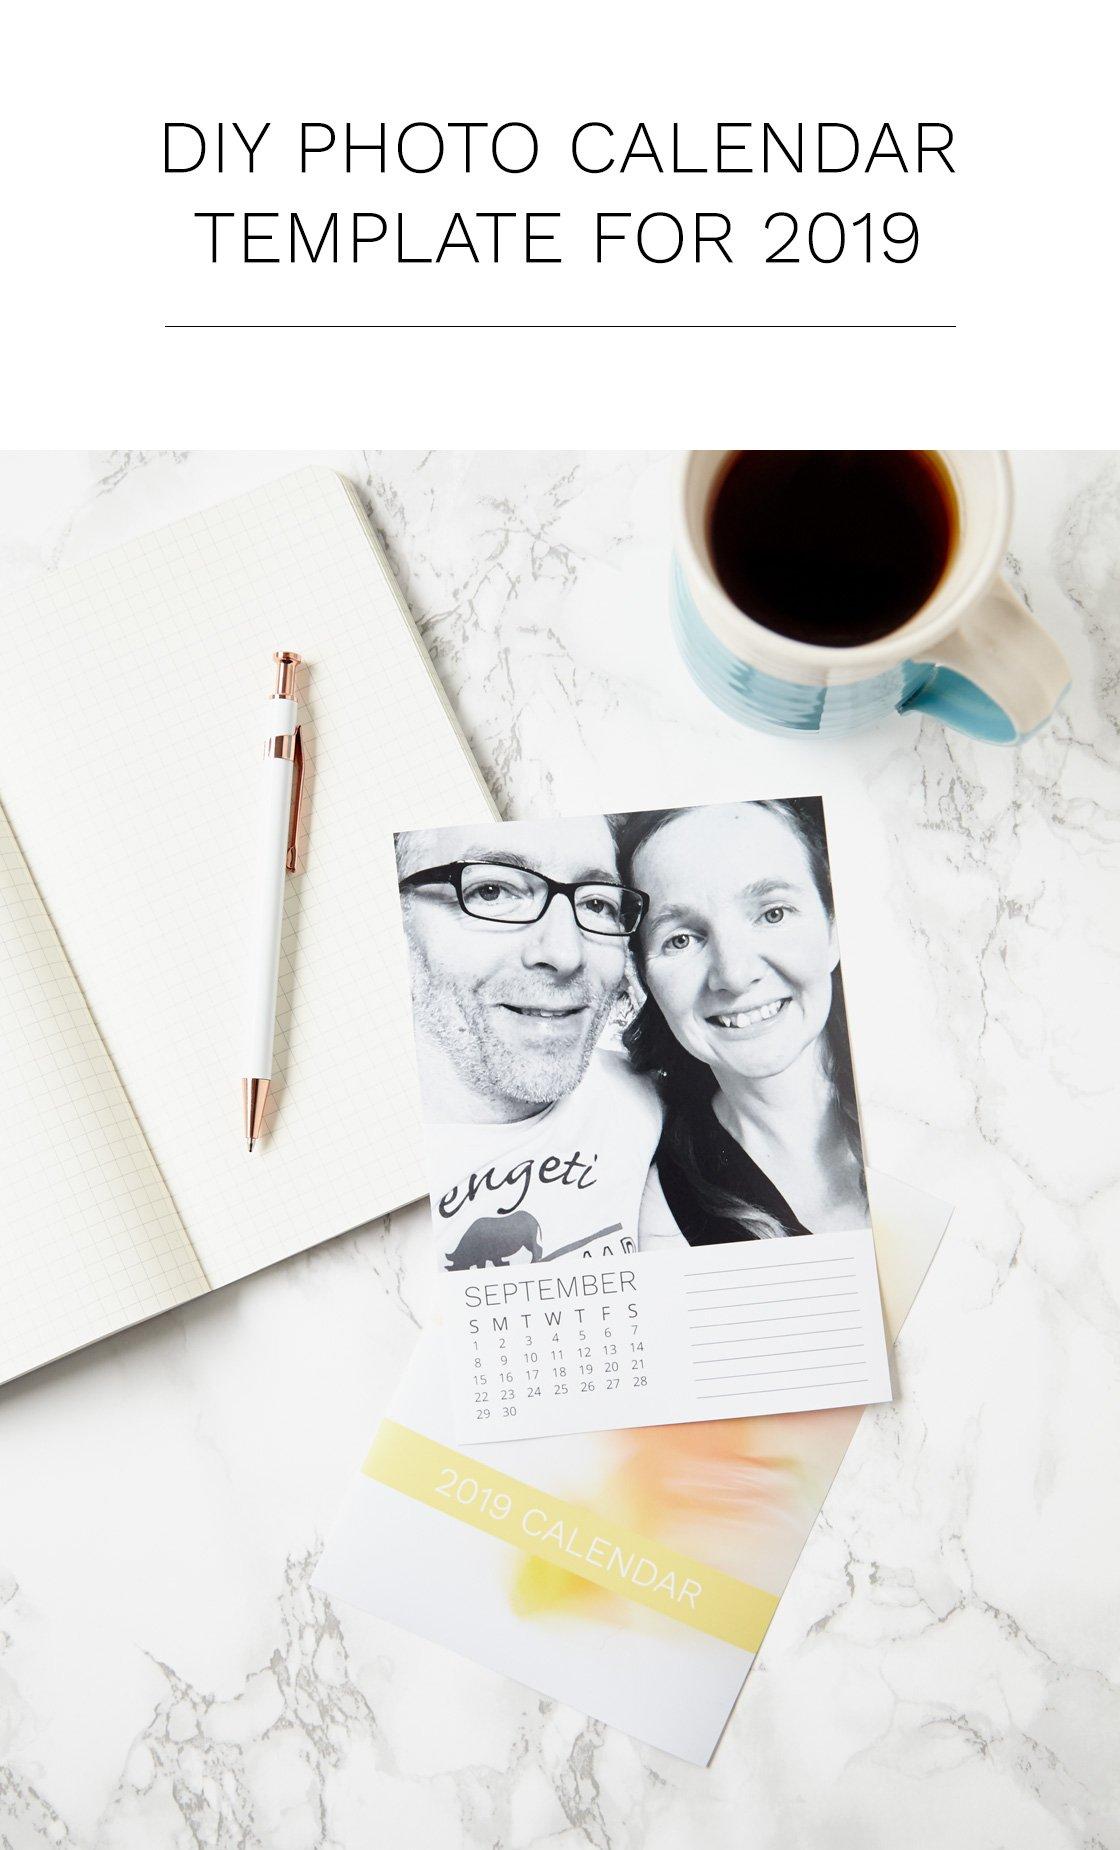 Diy Photo Calendar Template For 2019 Designed For Photoshop